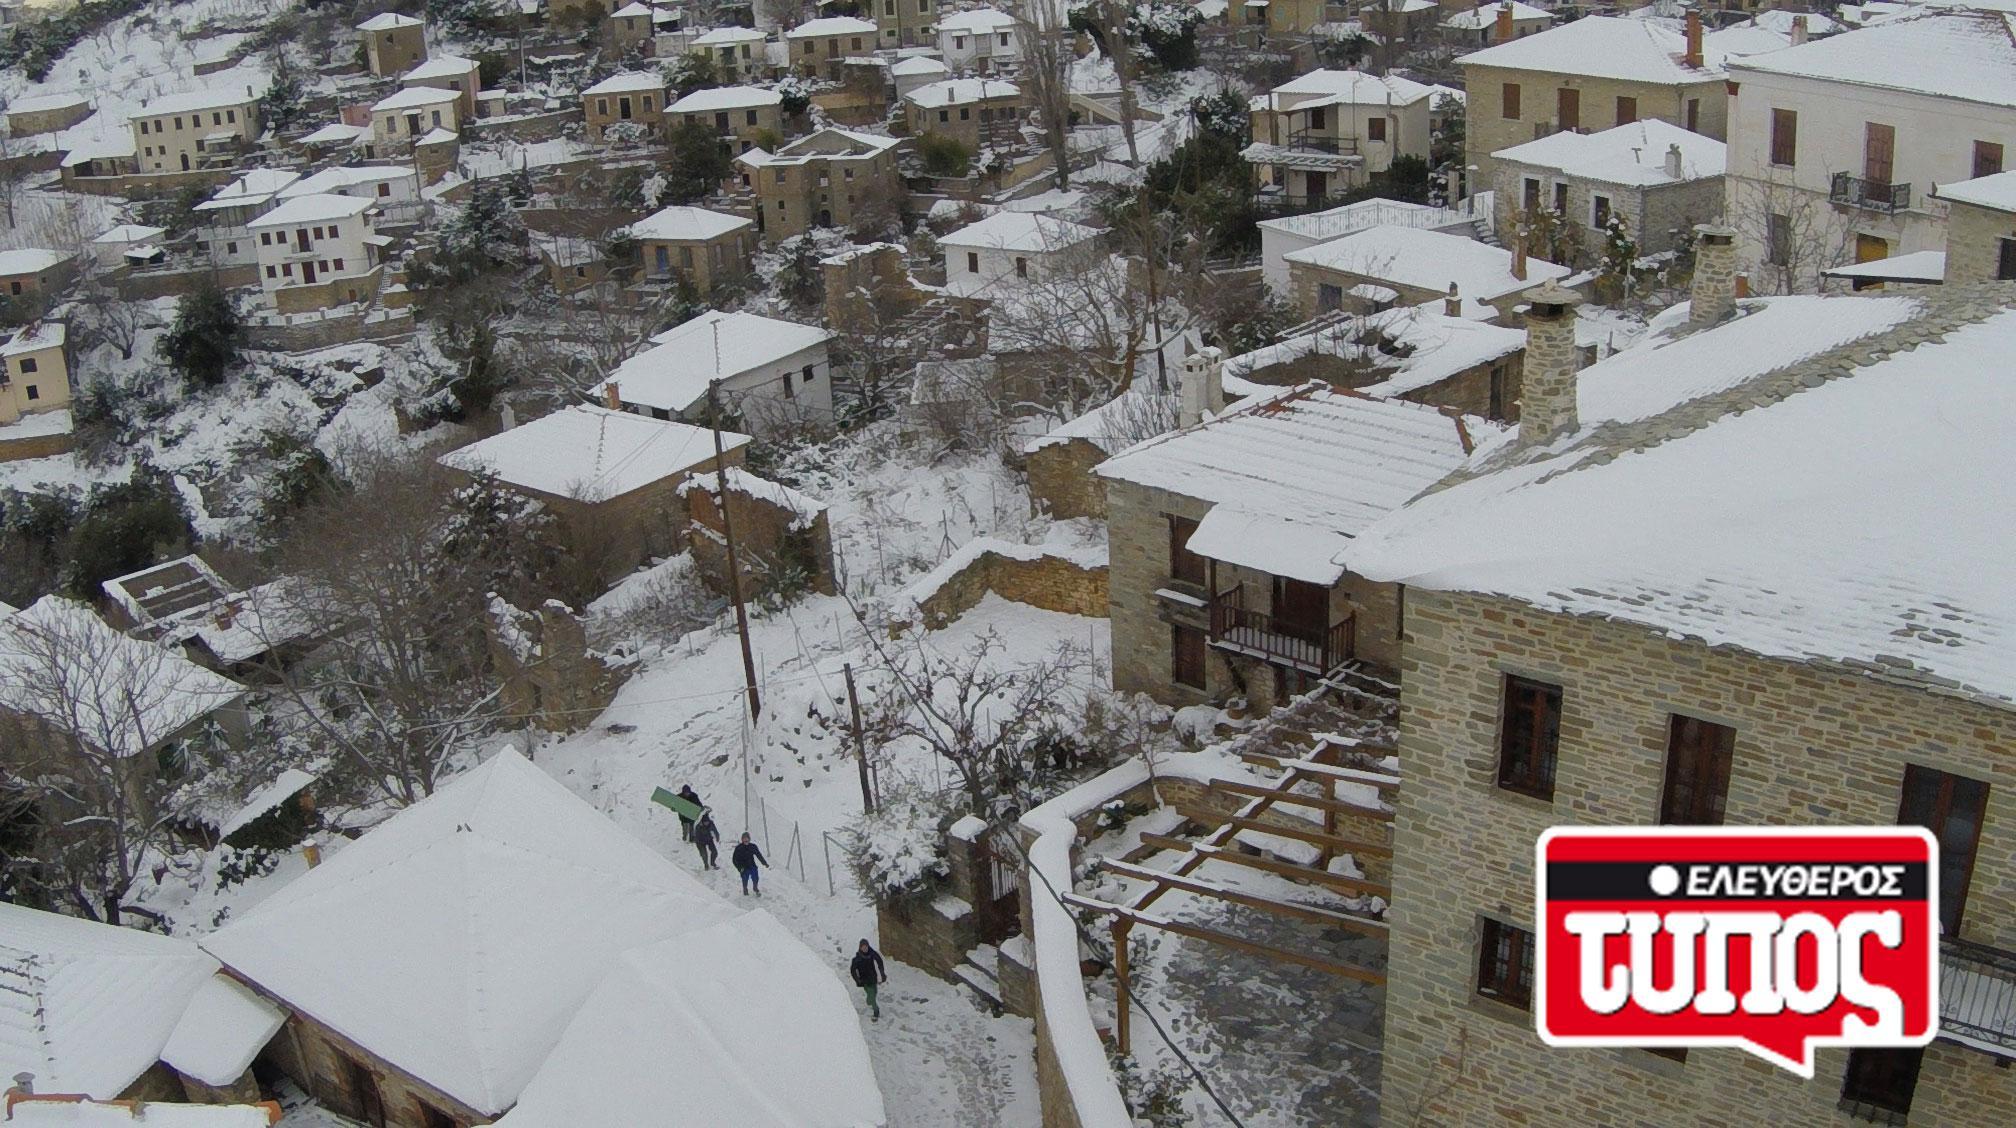 laukos-piliou-xionismenos-aerofotografies-1300-8 Εντυπωσιακές αεροφωτογραφίες από το χιονισμένο Λαύκο Πηλίου [εικόνες]